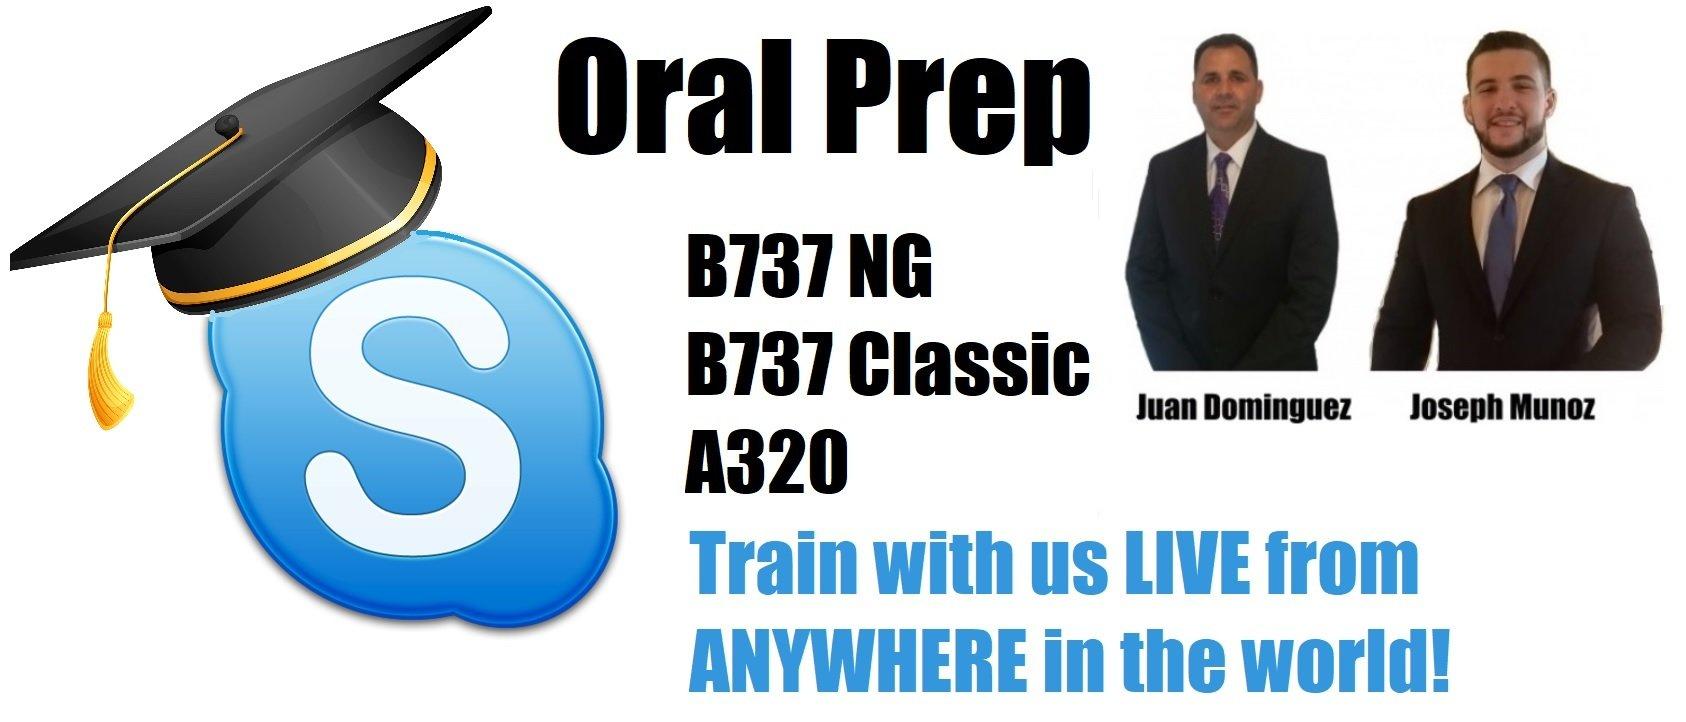 Skype Oral Prep LIVE with Joe or Juan 00009